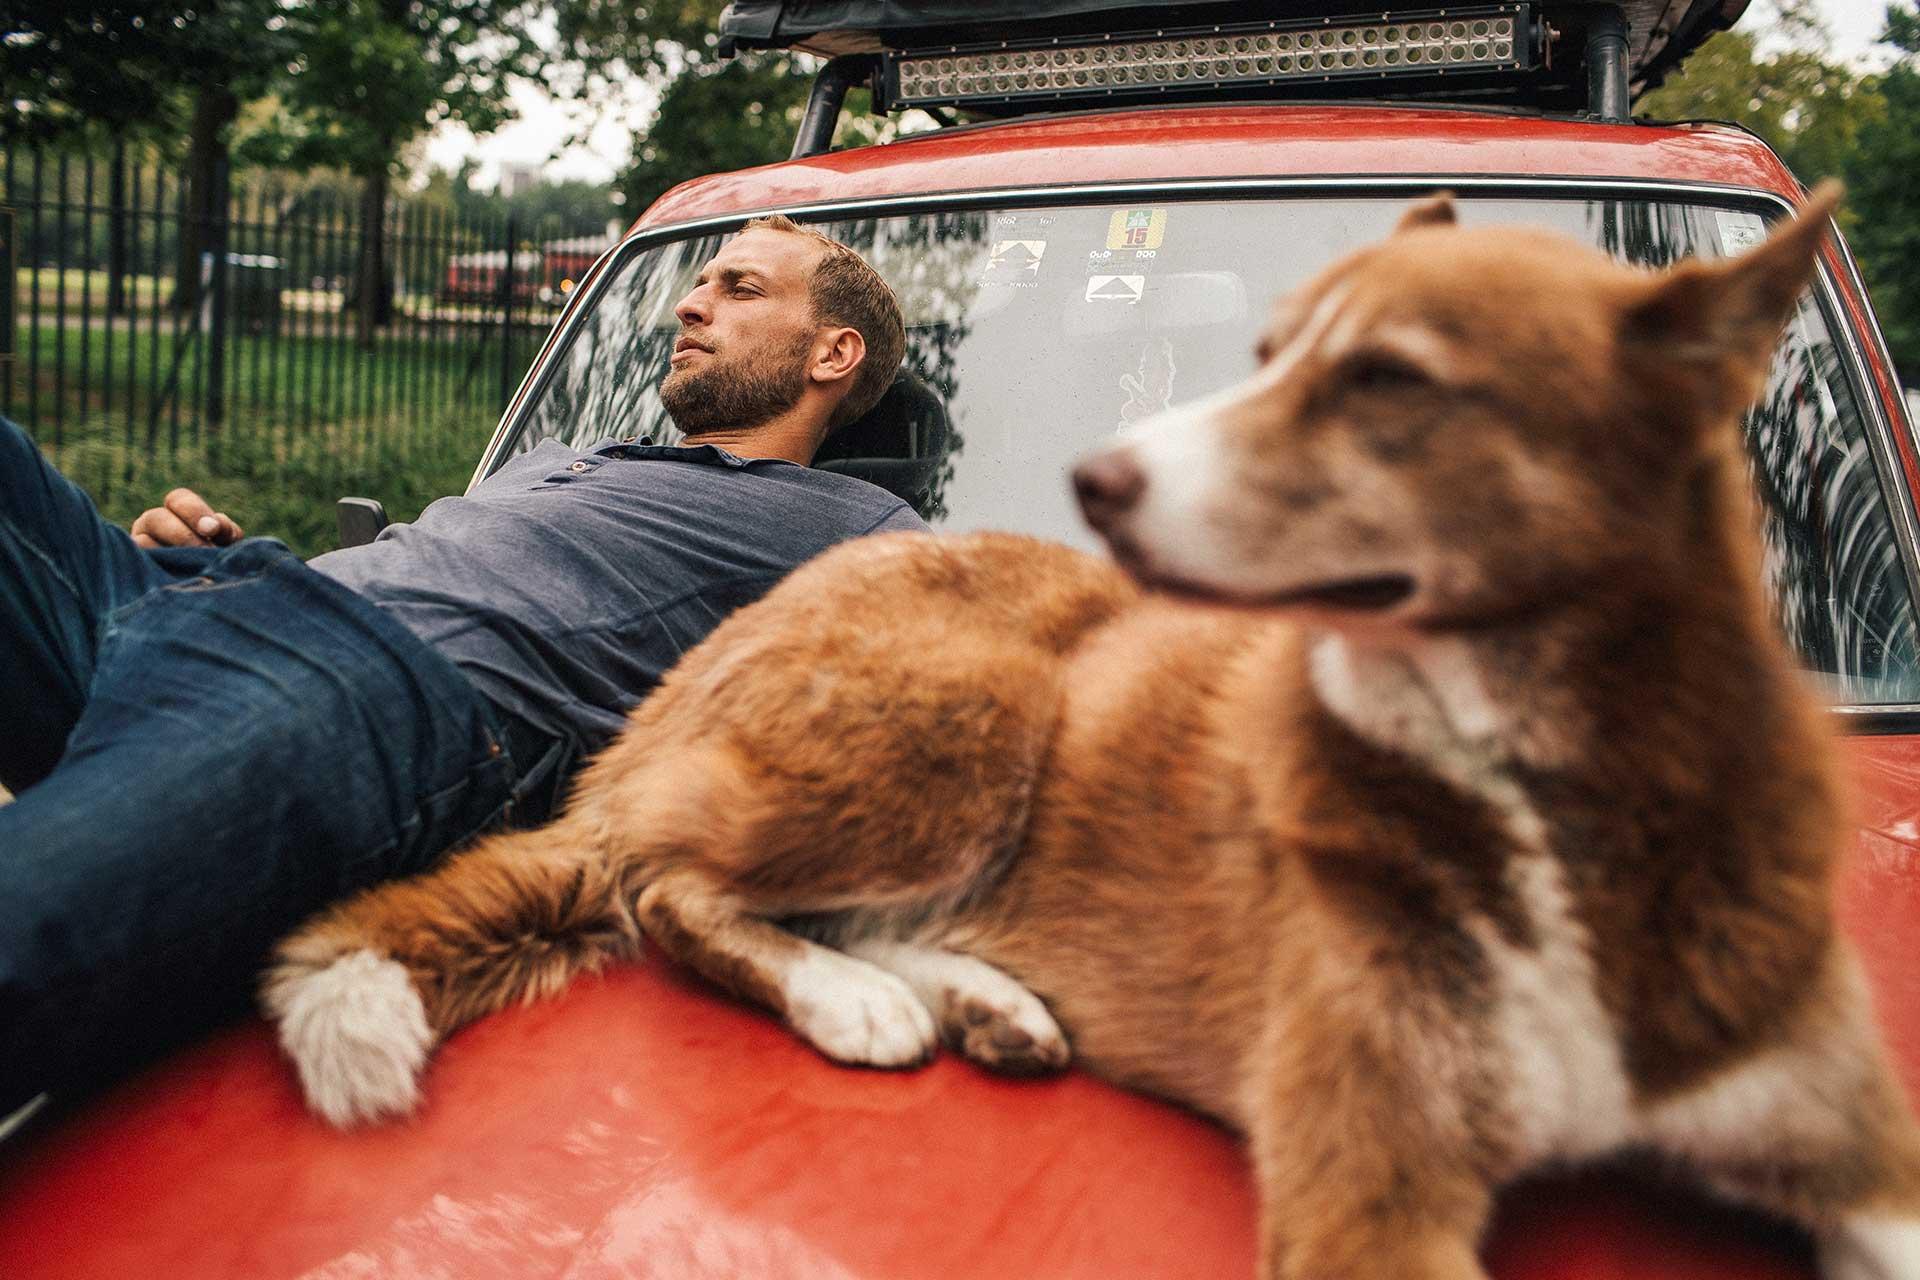 Hund Landcruiser Dachzelt Urban Vanlife Lifestyle Fotograf Michael Müller